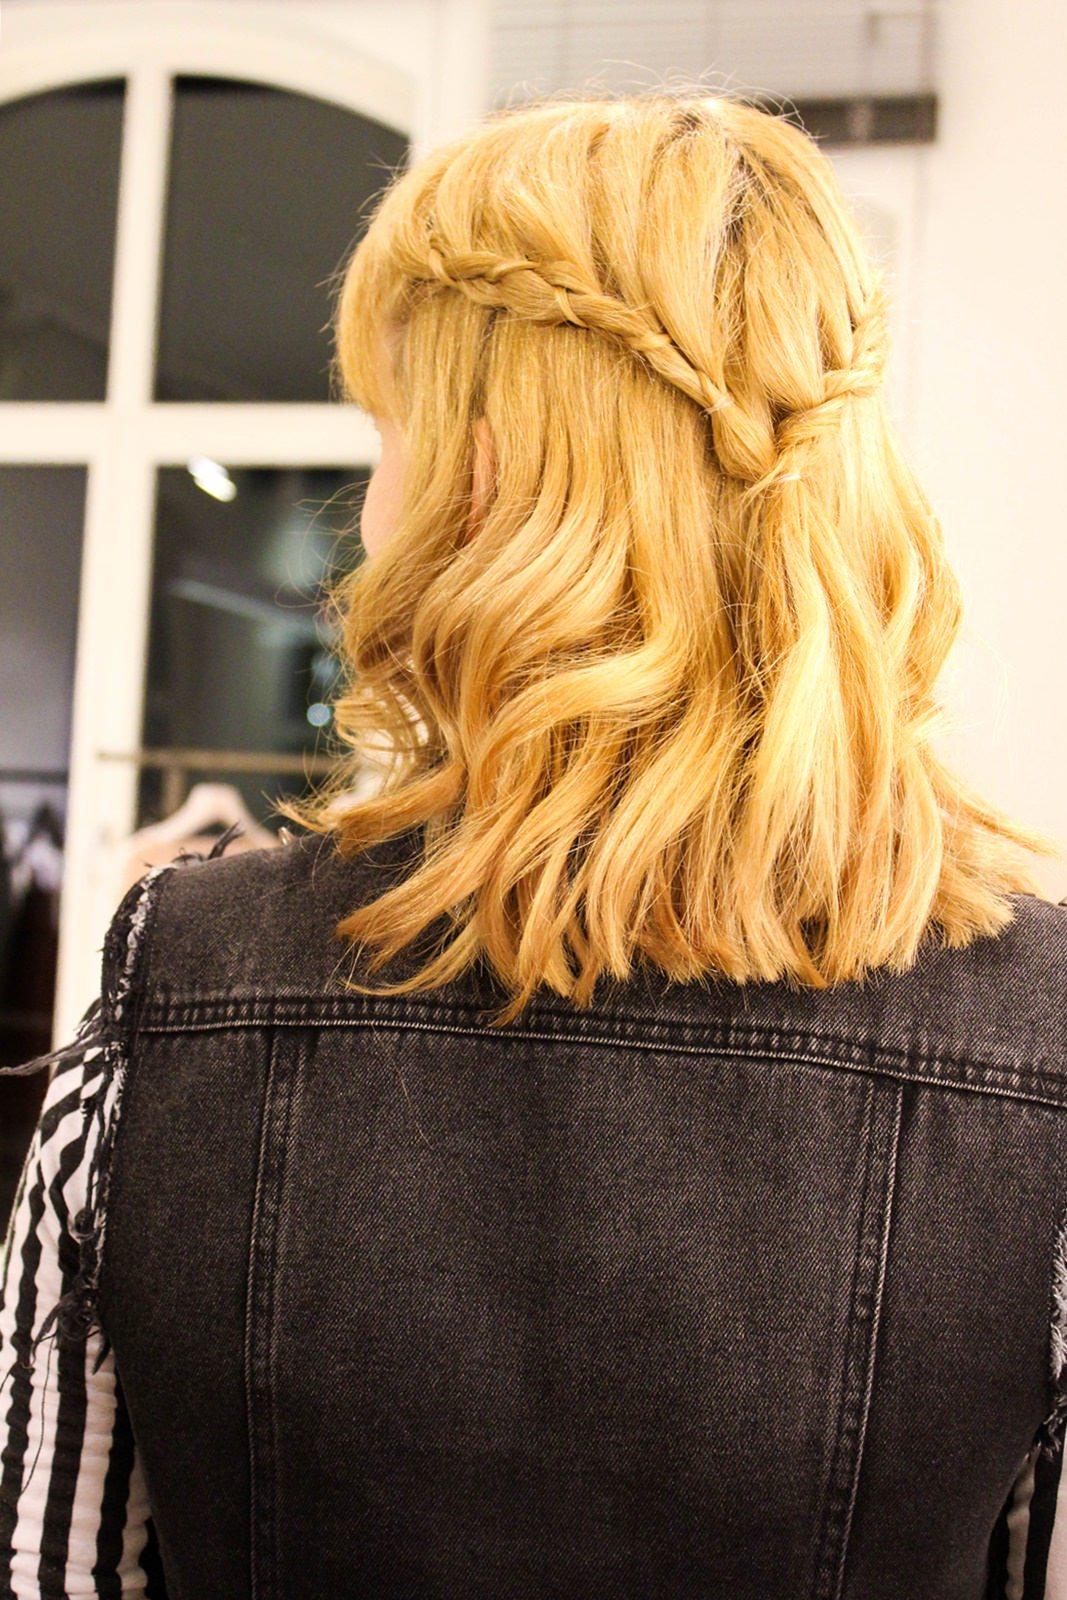 So sah die Frisur im Detail aus